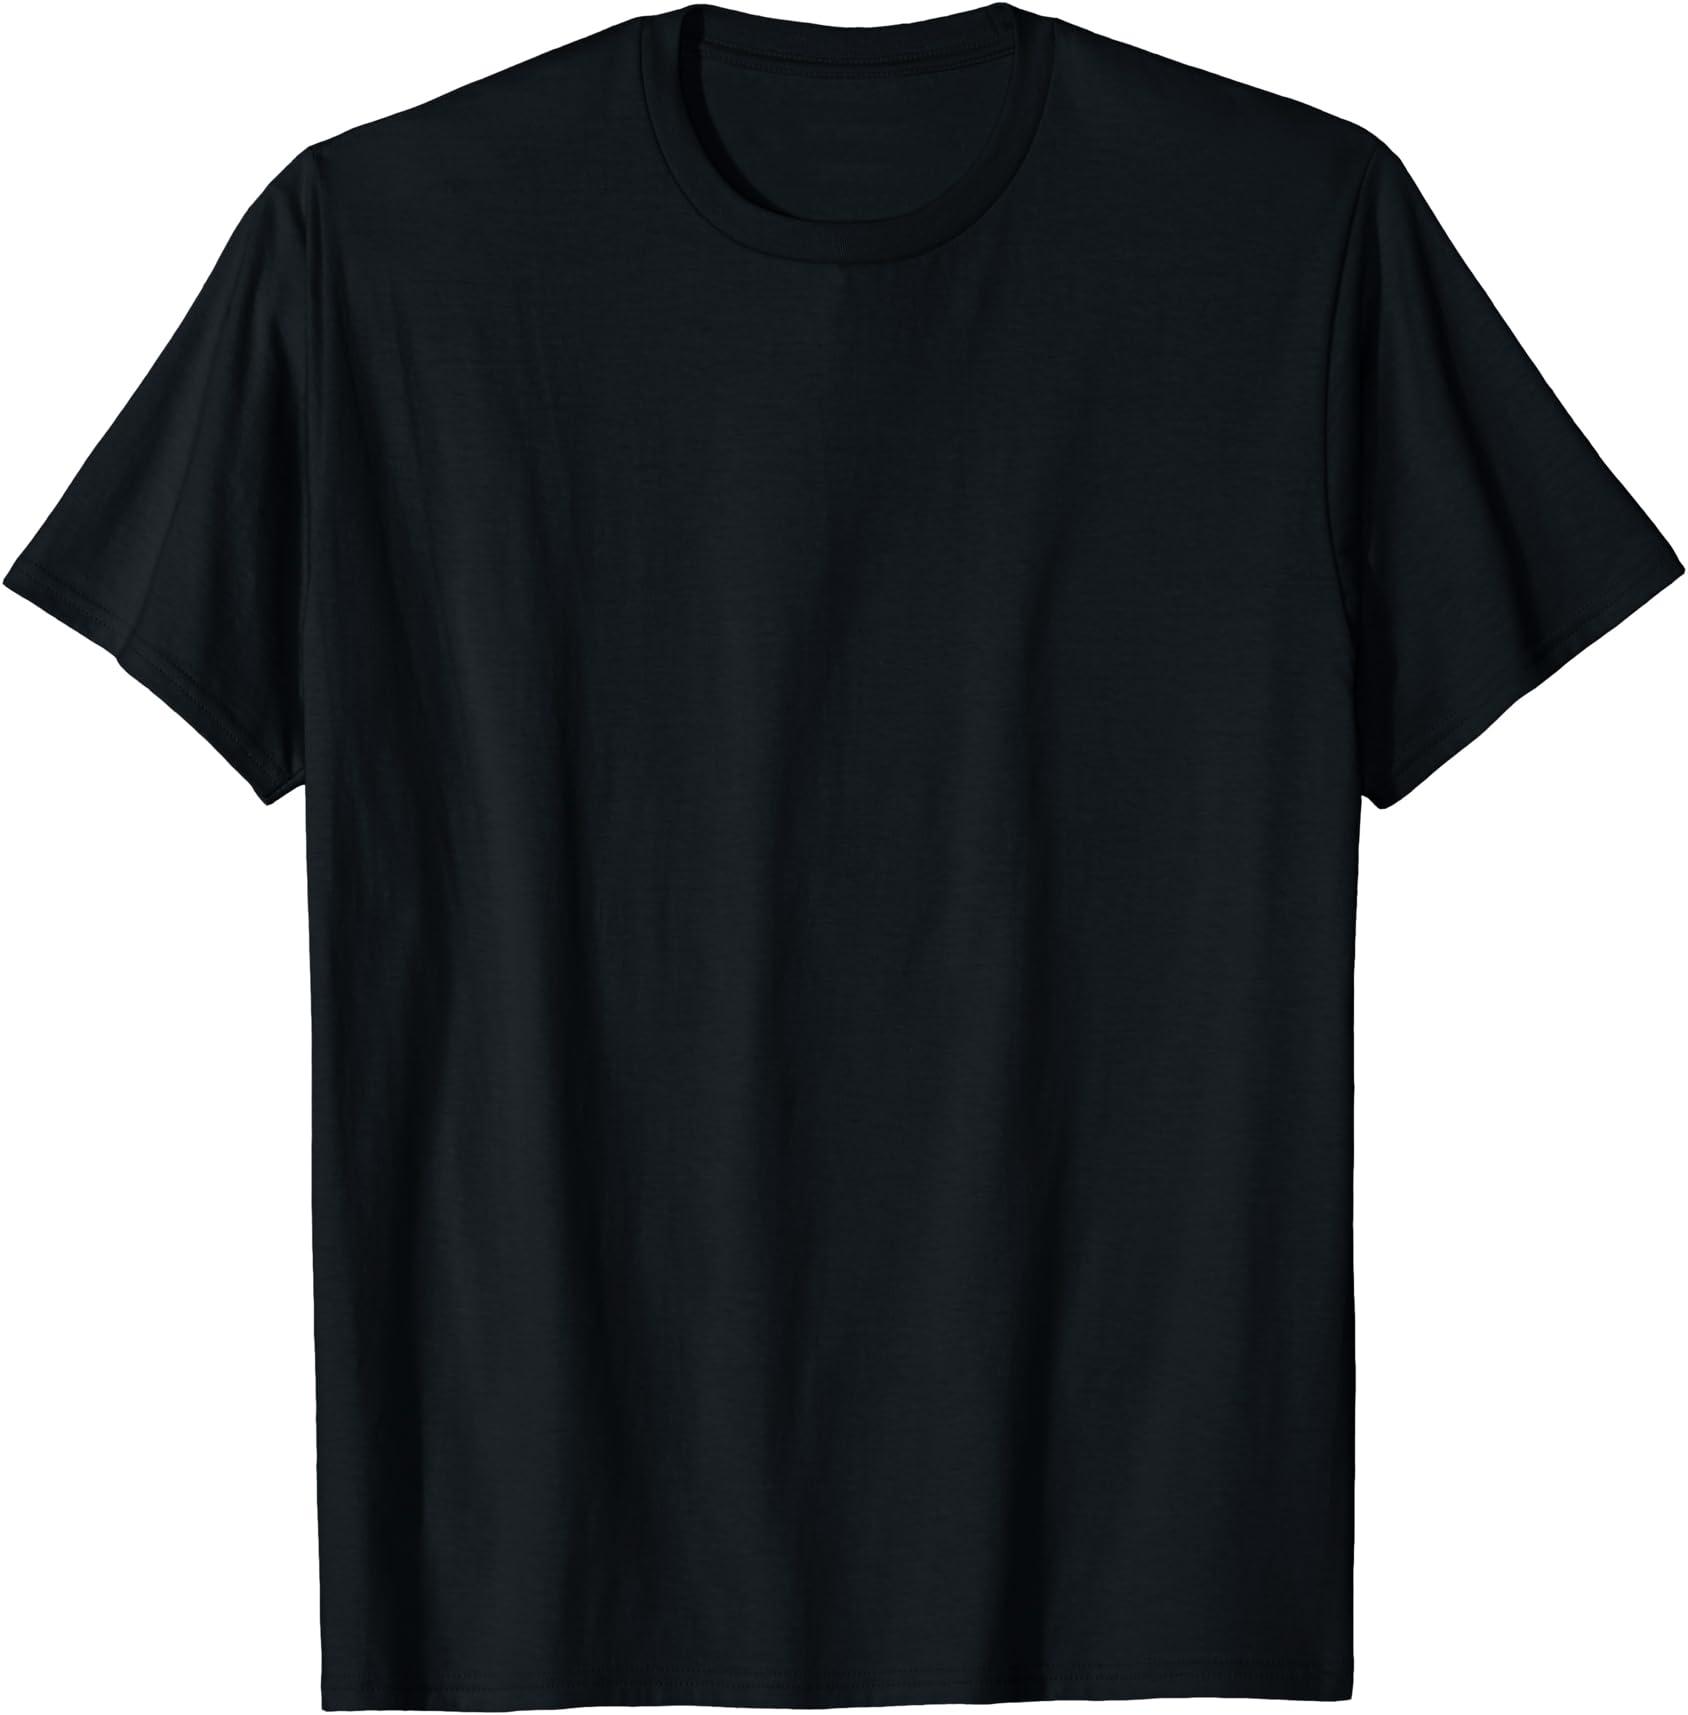 I Just Look Straight T-Shirt Both Ways LGBT Humor Funny LGBTQ Gay Birthday Gift